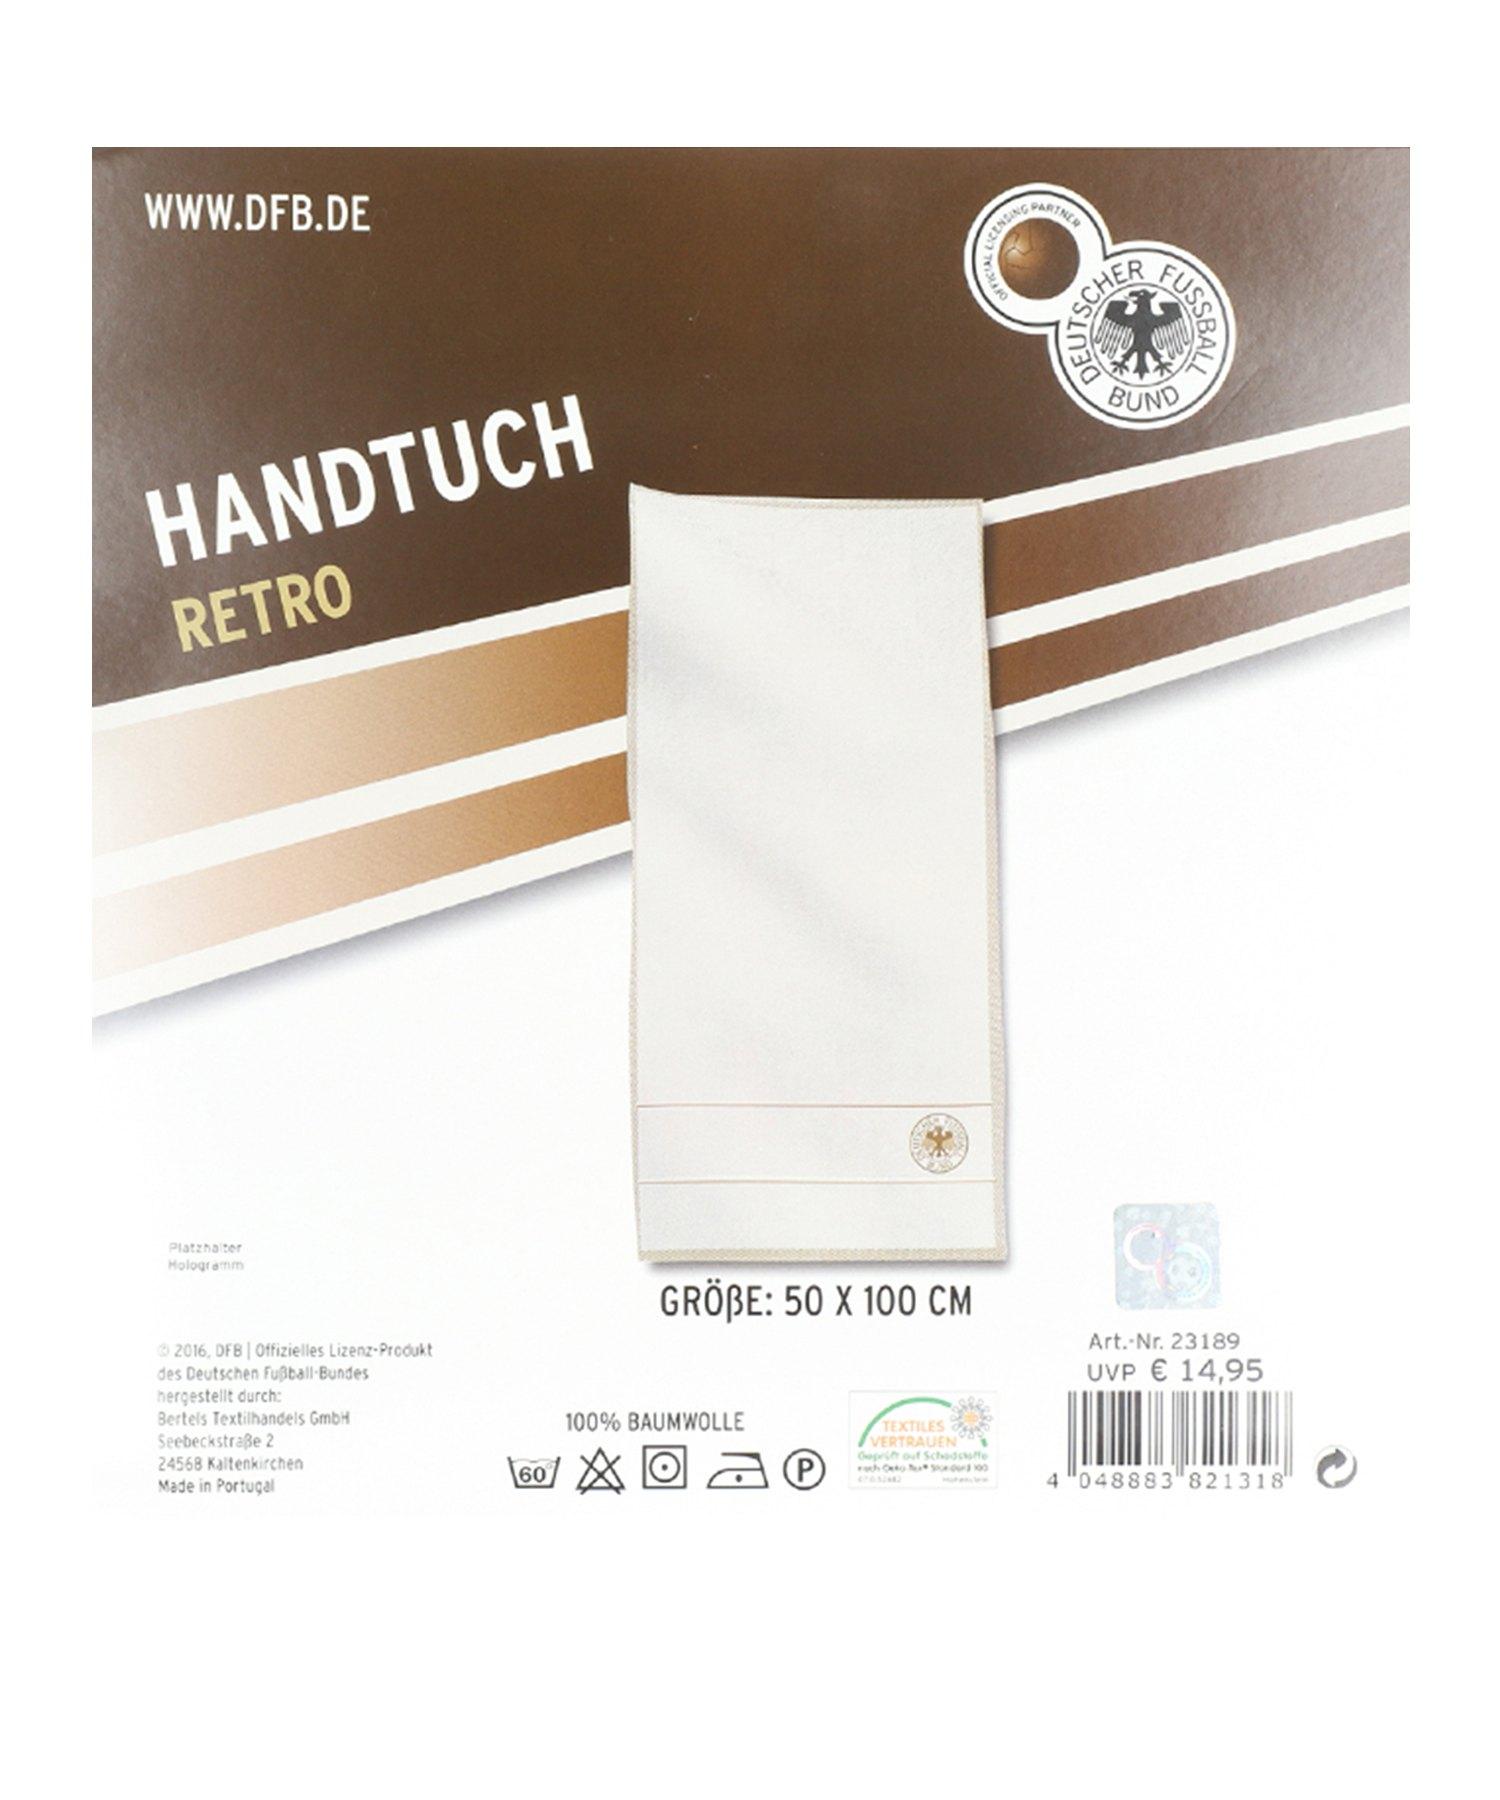 Dfb Handtuch